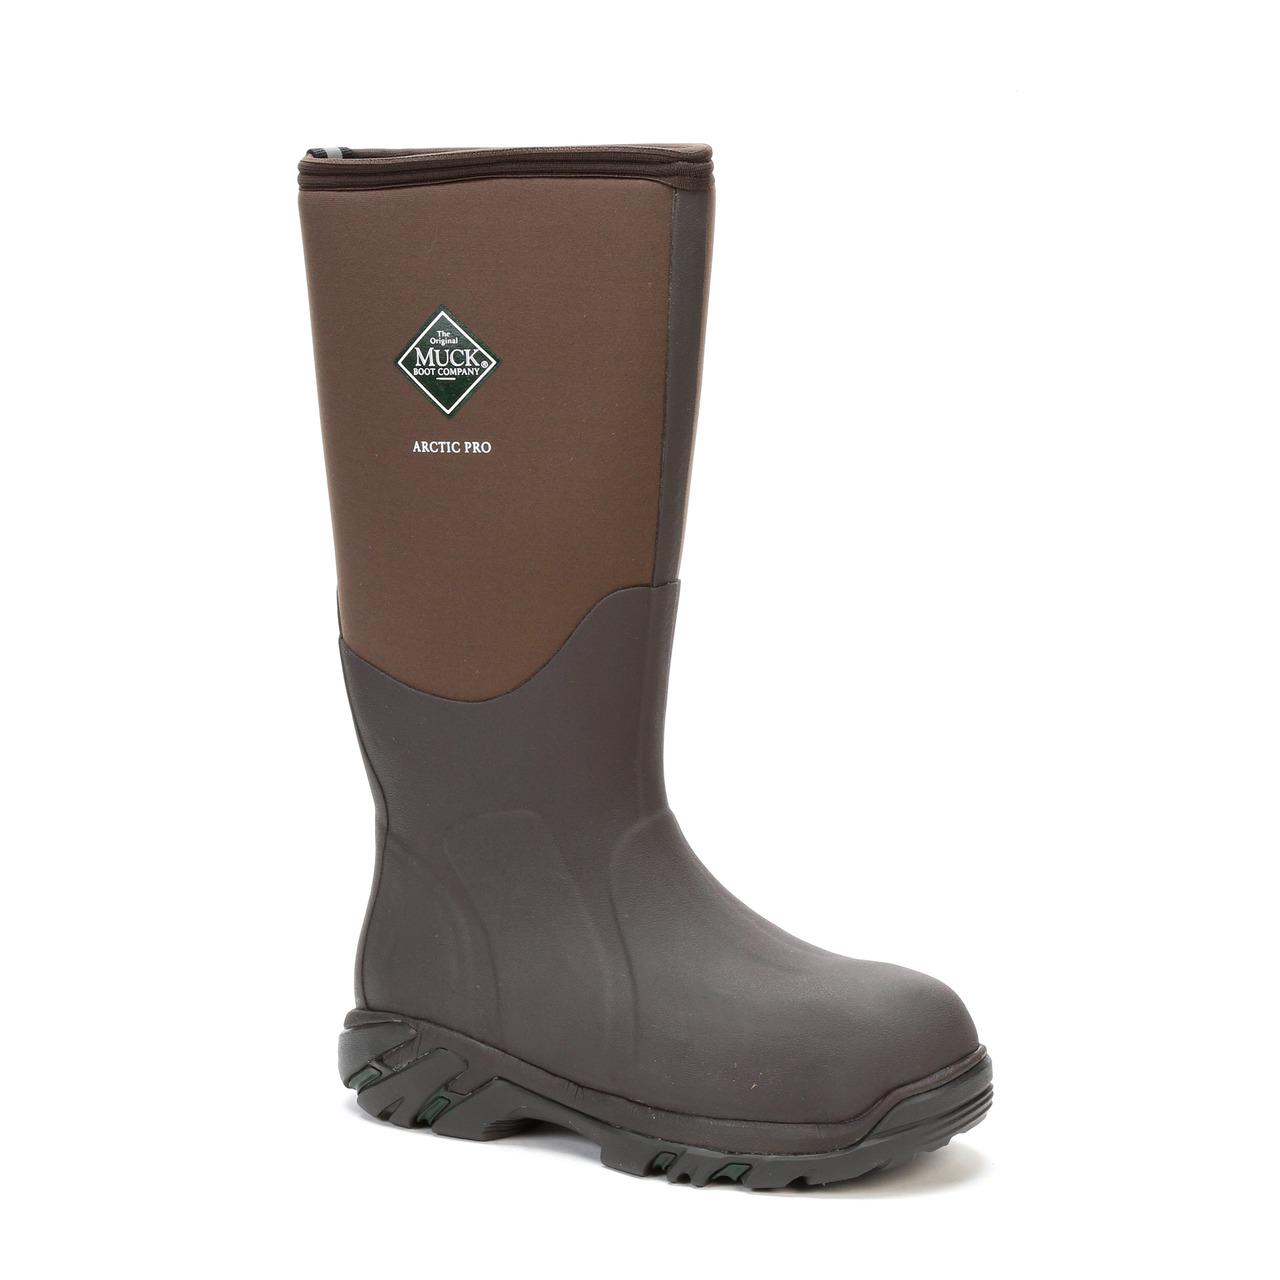 Muck Boots Usa - Cr Boot